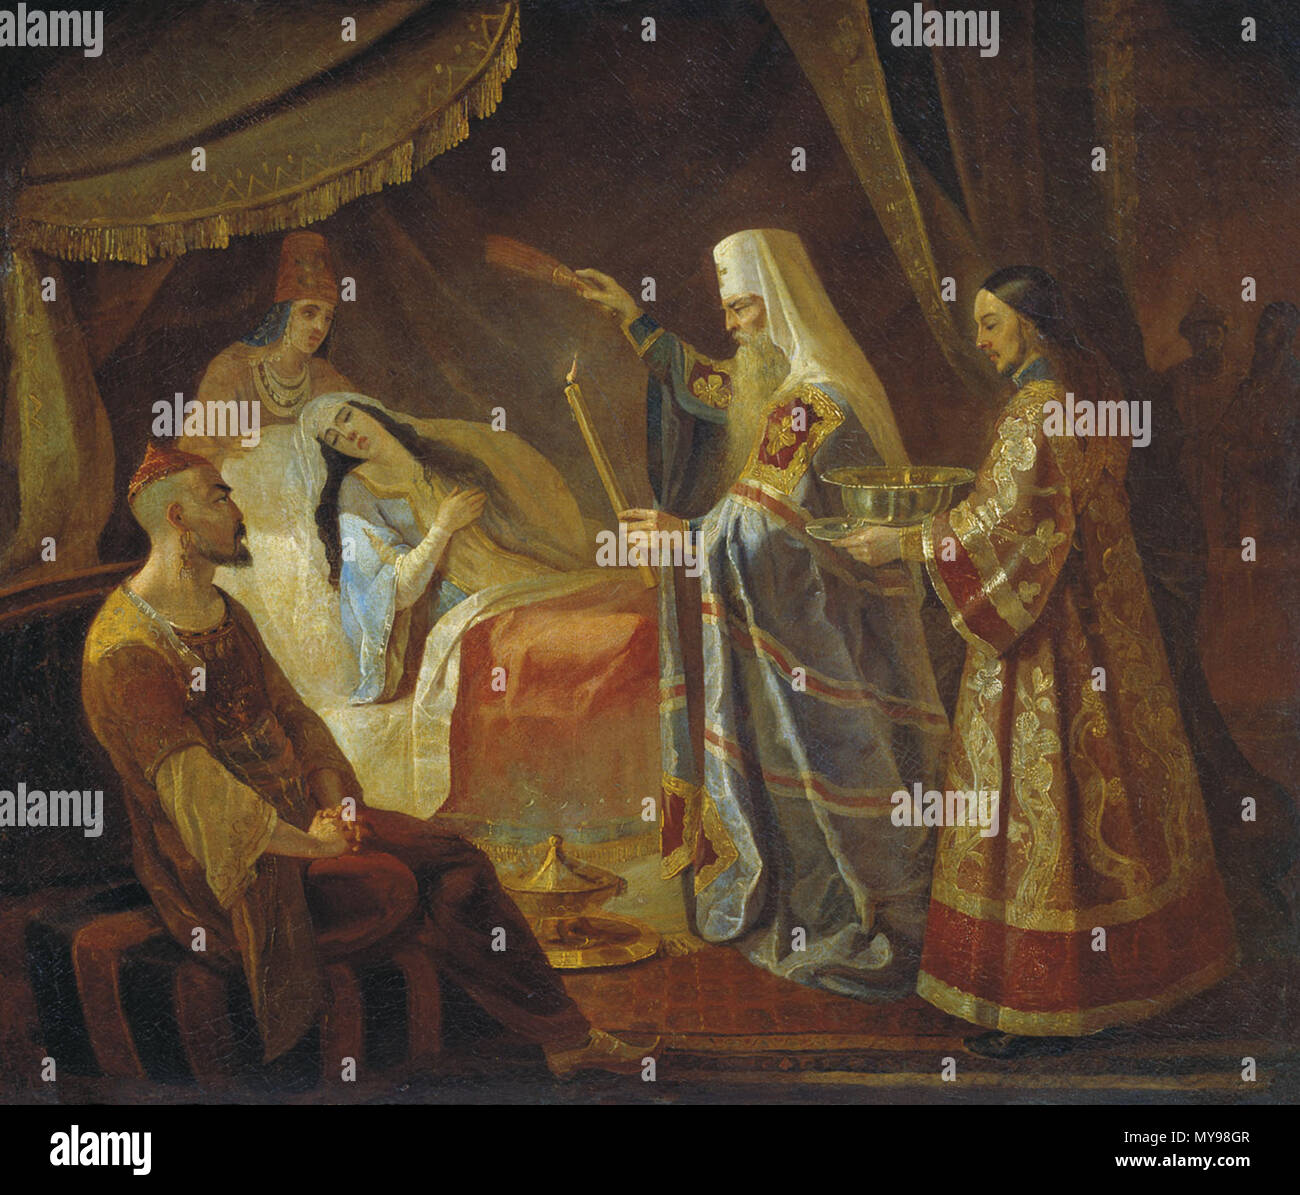 . Metropolitan Alexis Healing the Tatar Tsarina Taidula from Blindness . 19th century. Yakov Kapkov (1816-54) 30 Alessio-Kapkov Stock Photo